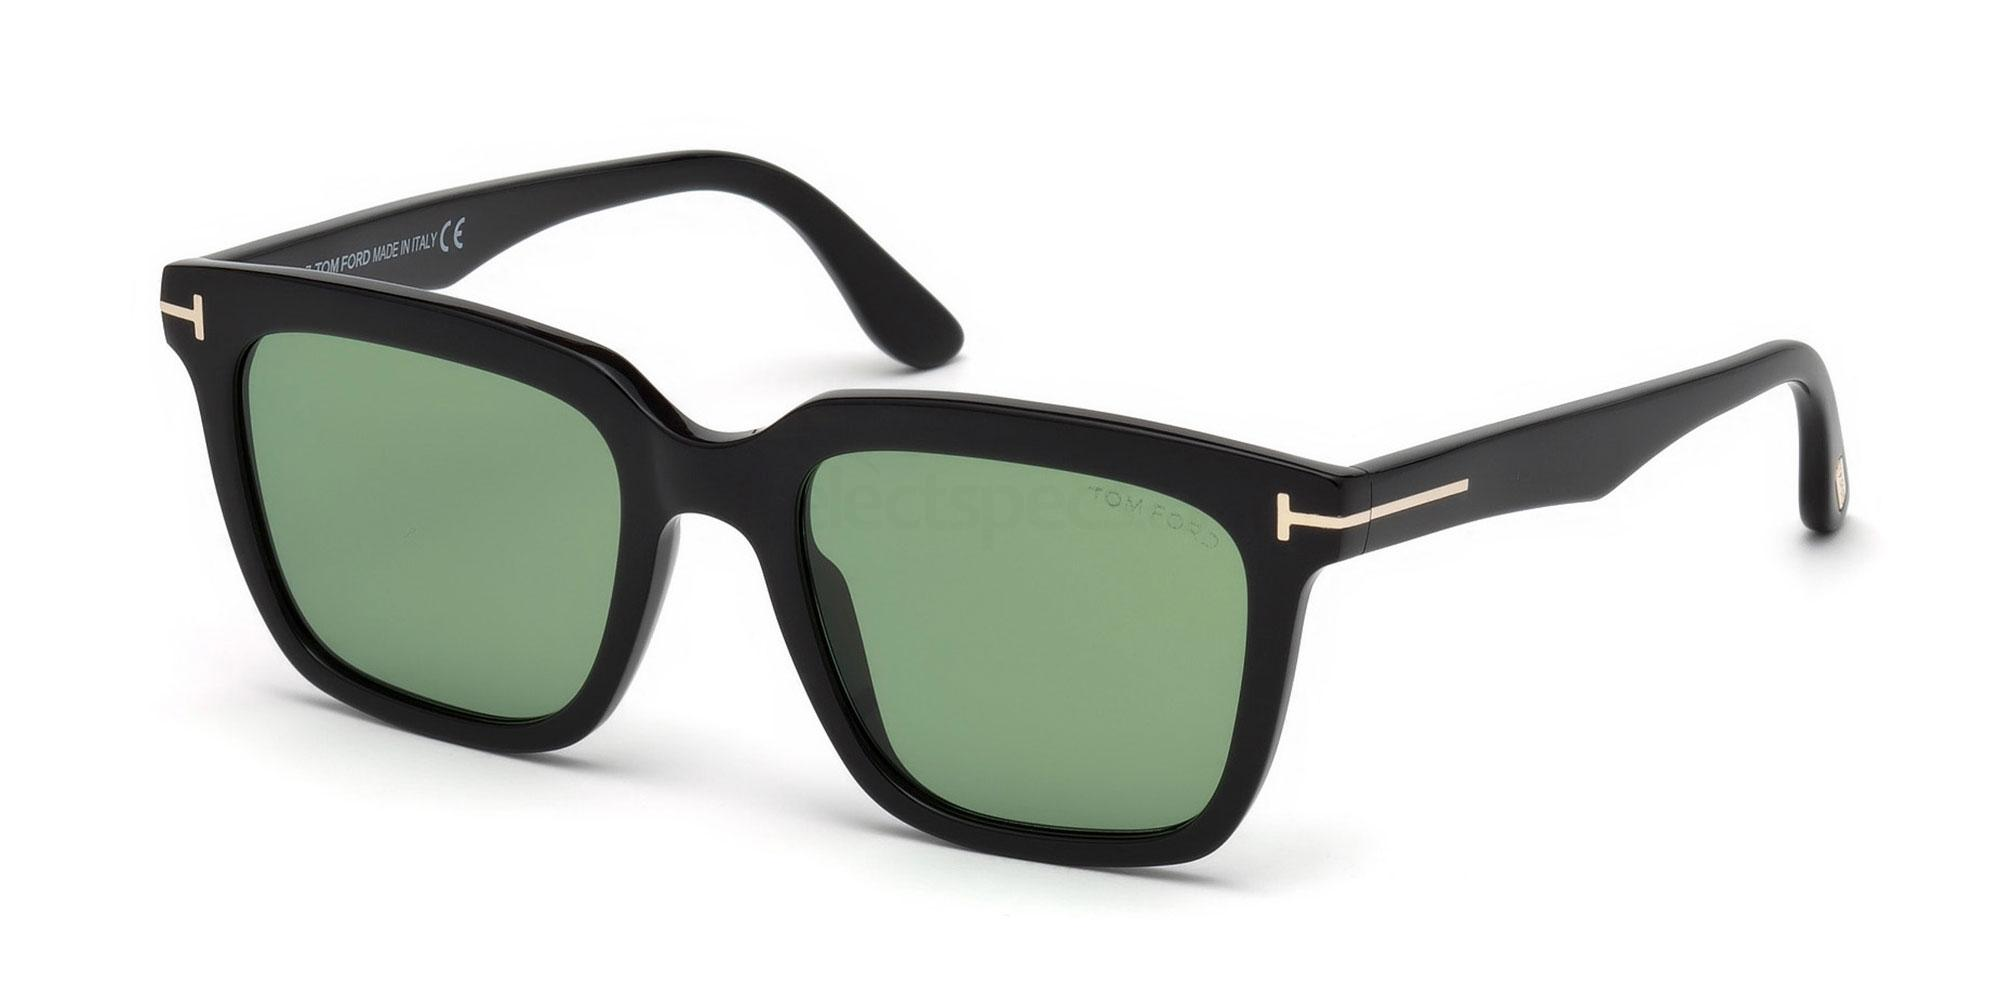 01N FT0646 Sunglasses, Tom Ford